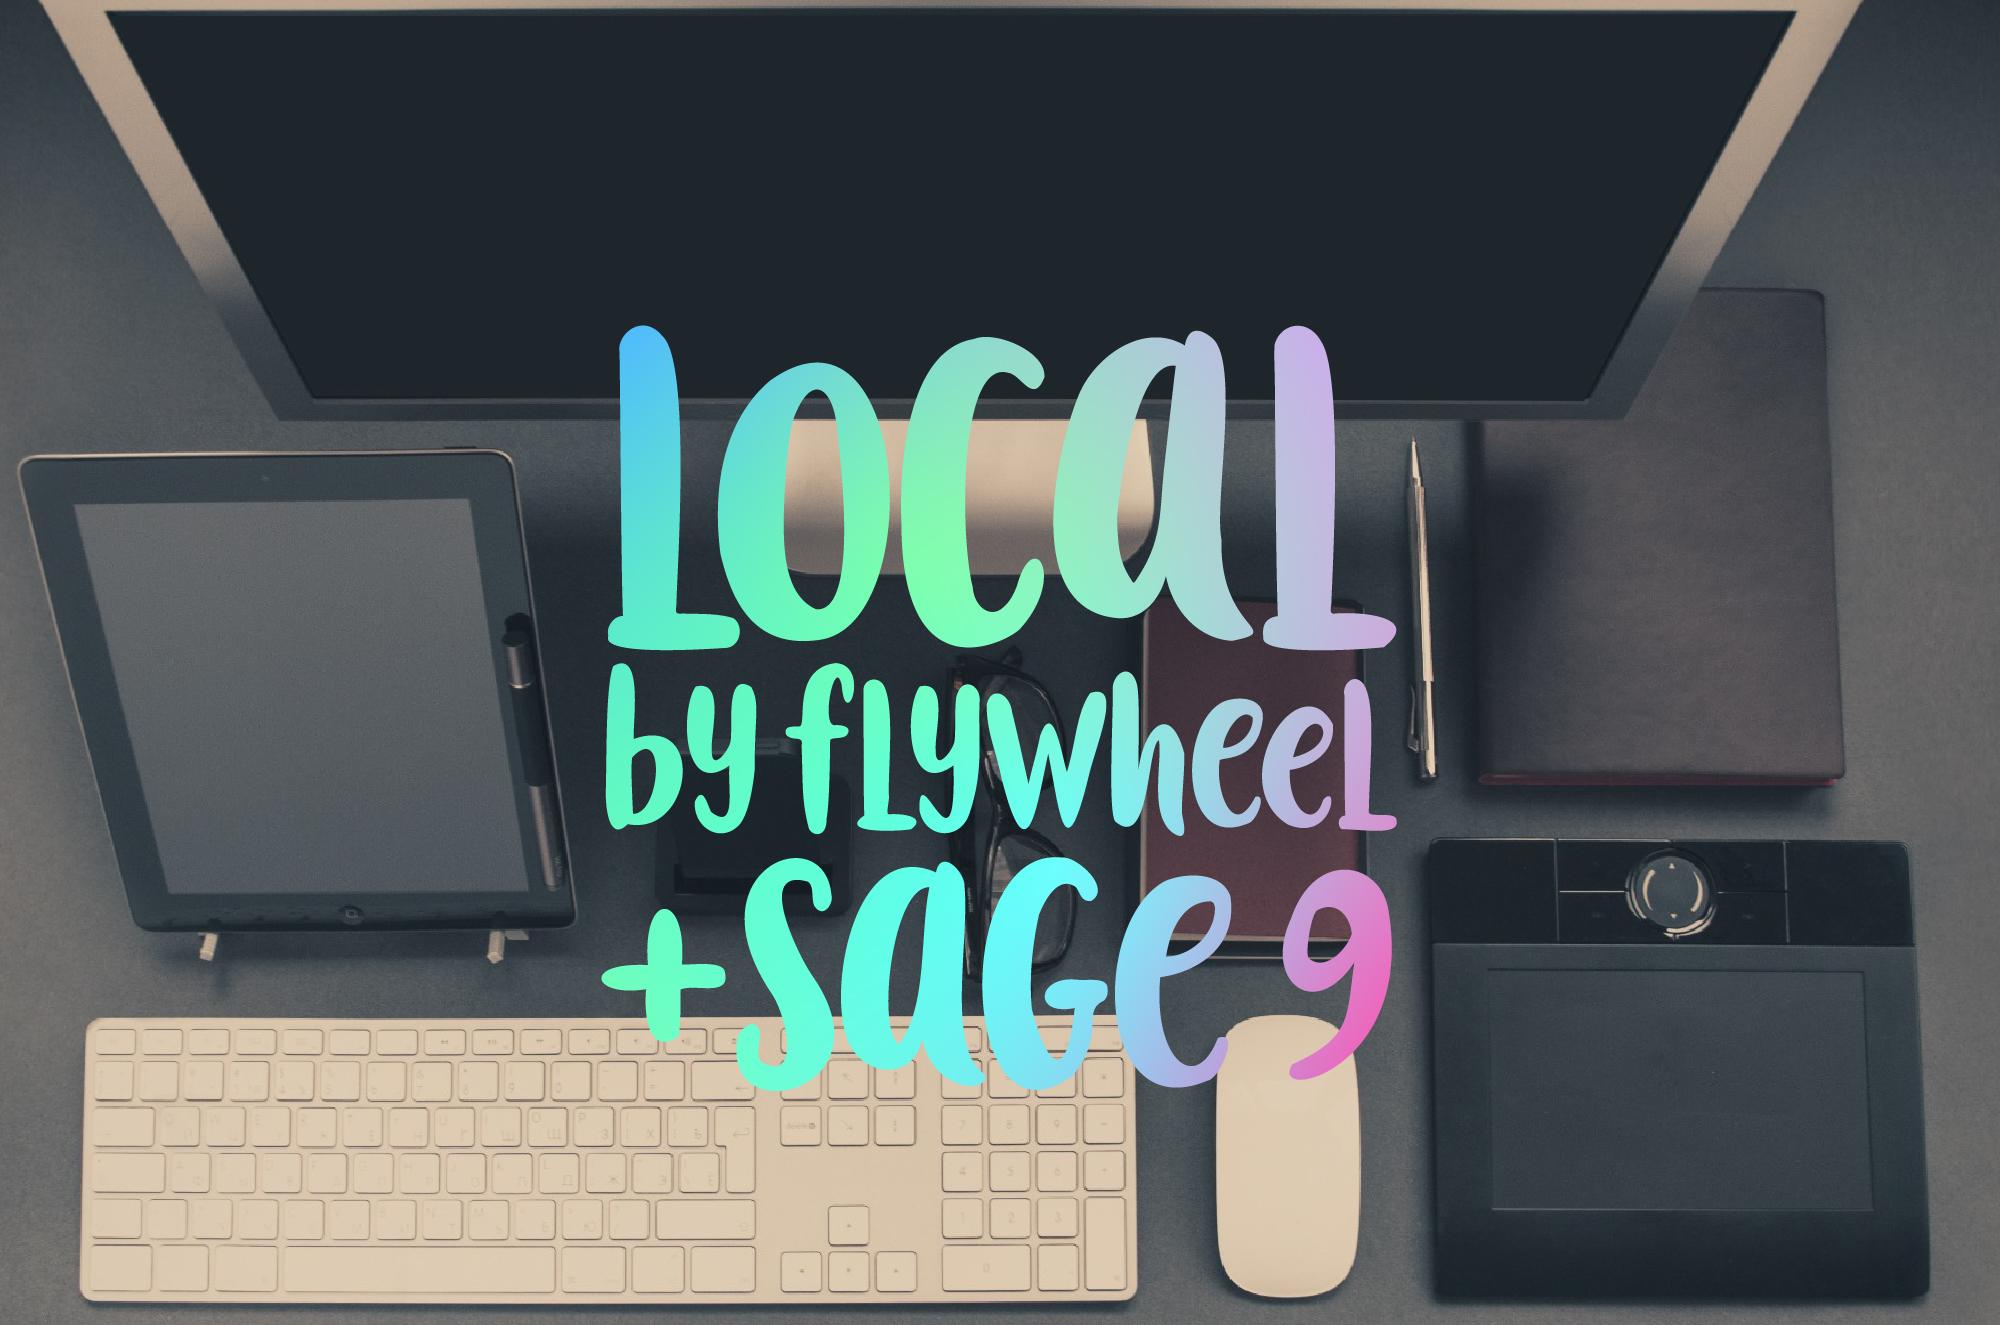 Localbyflywheel+sage9